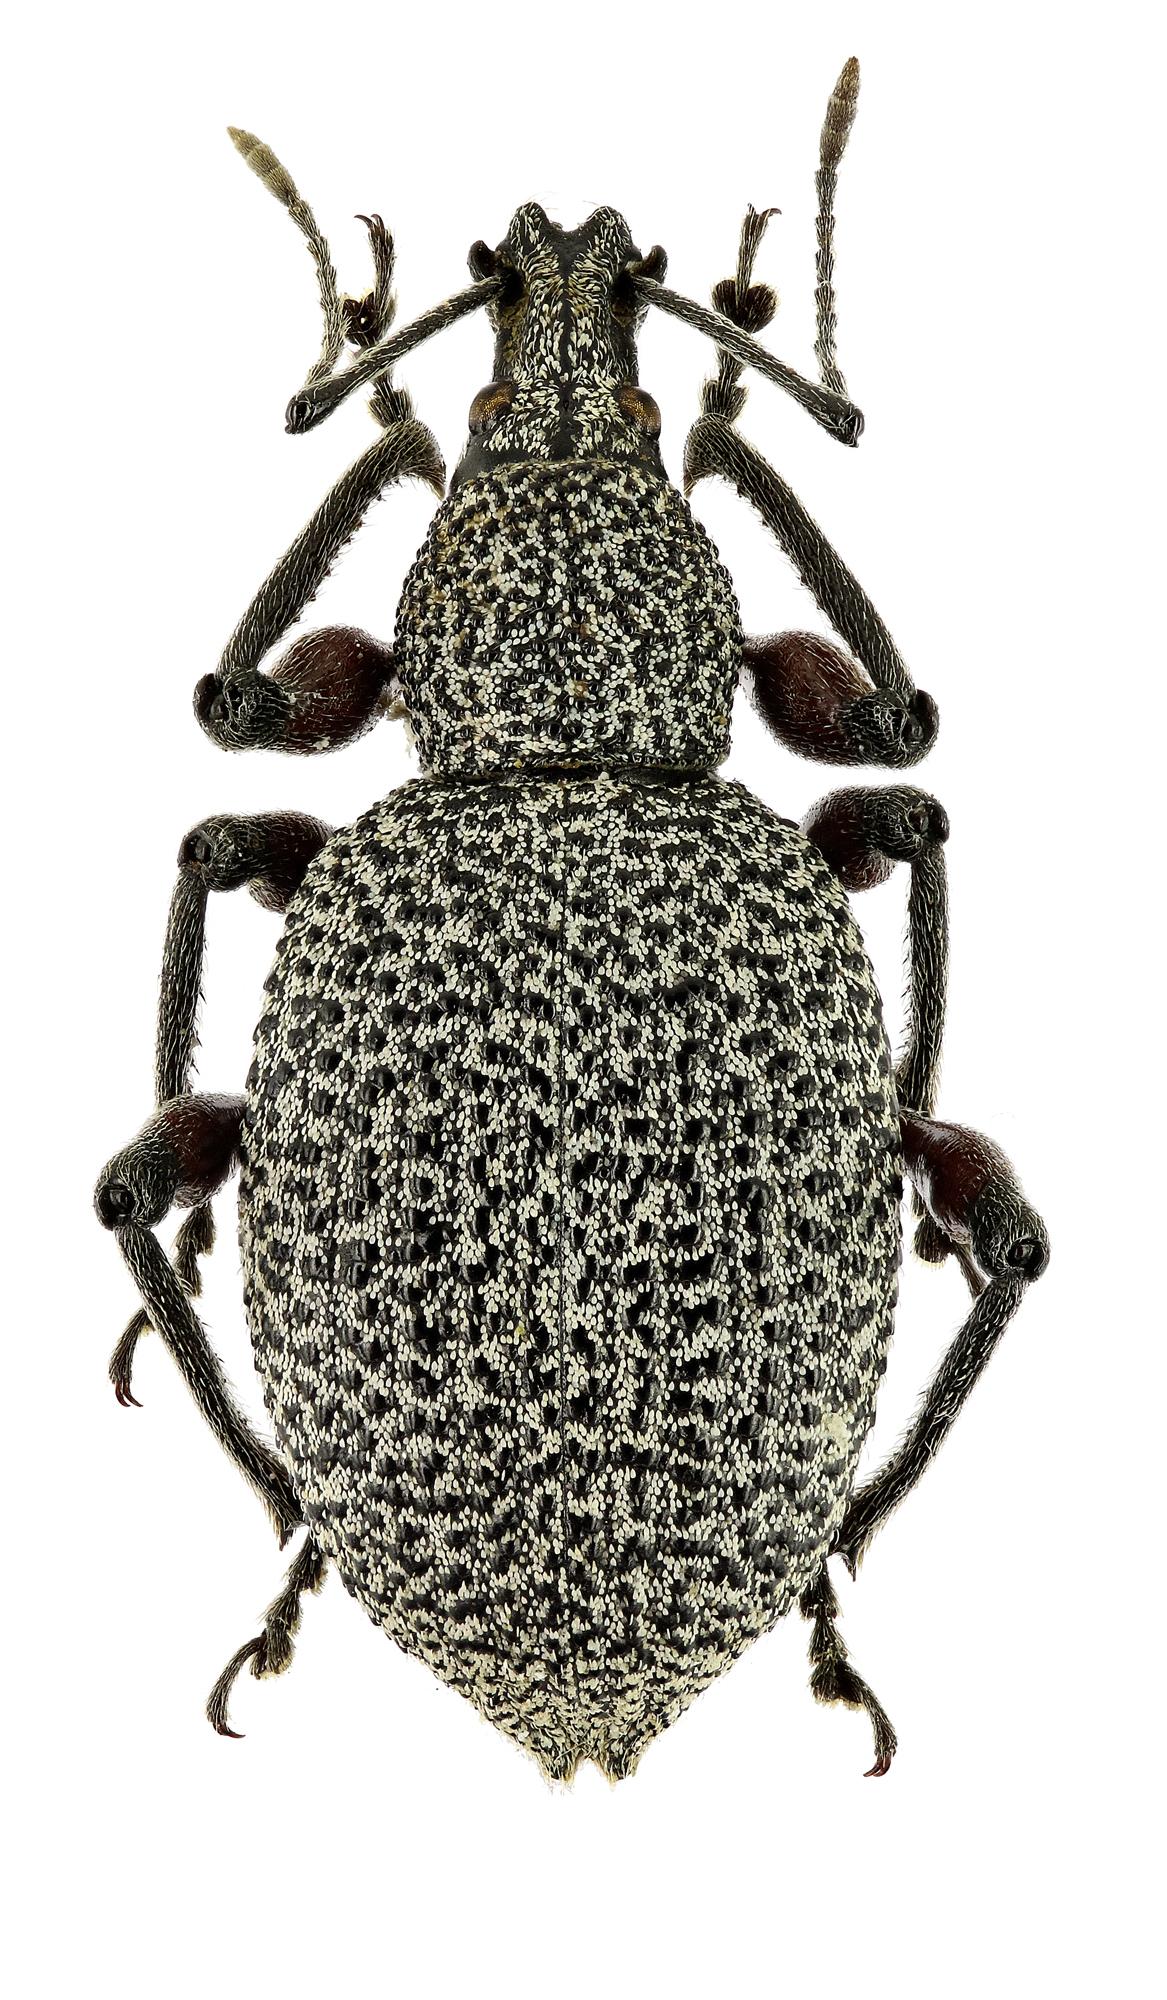 Otiorhynchus (Otiorhynchus) rhacusensis EOS 70D 7781cz03.jpg